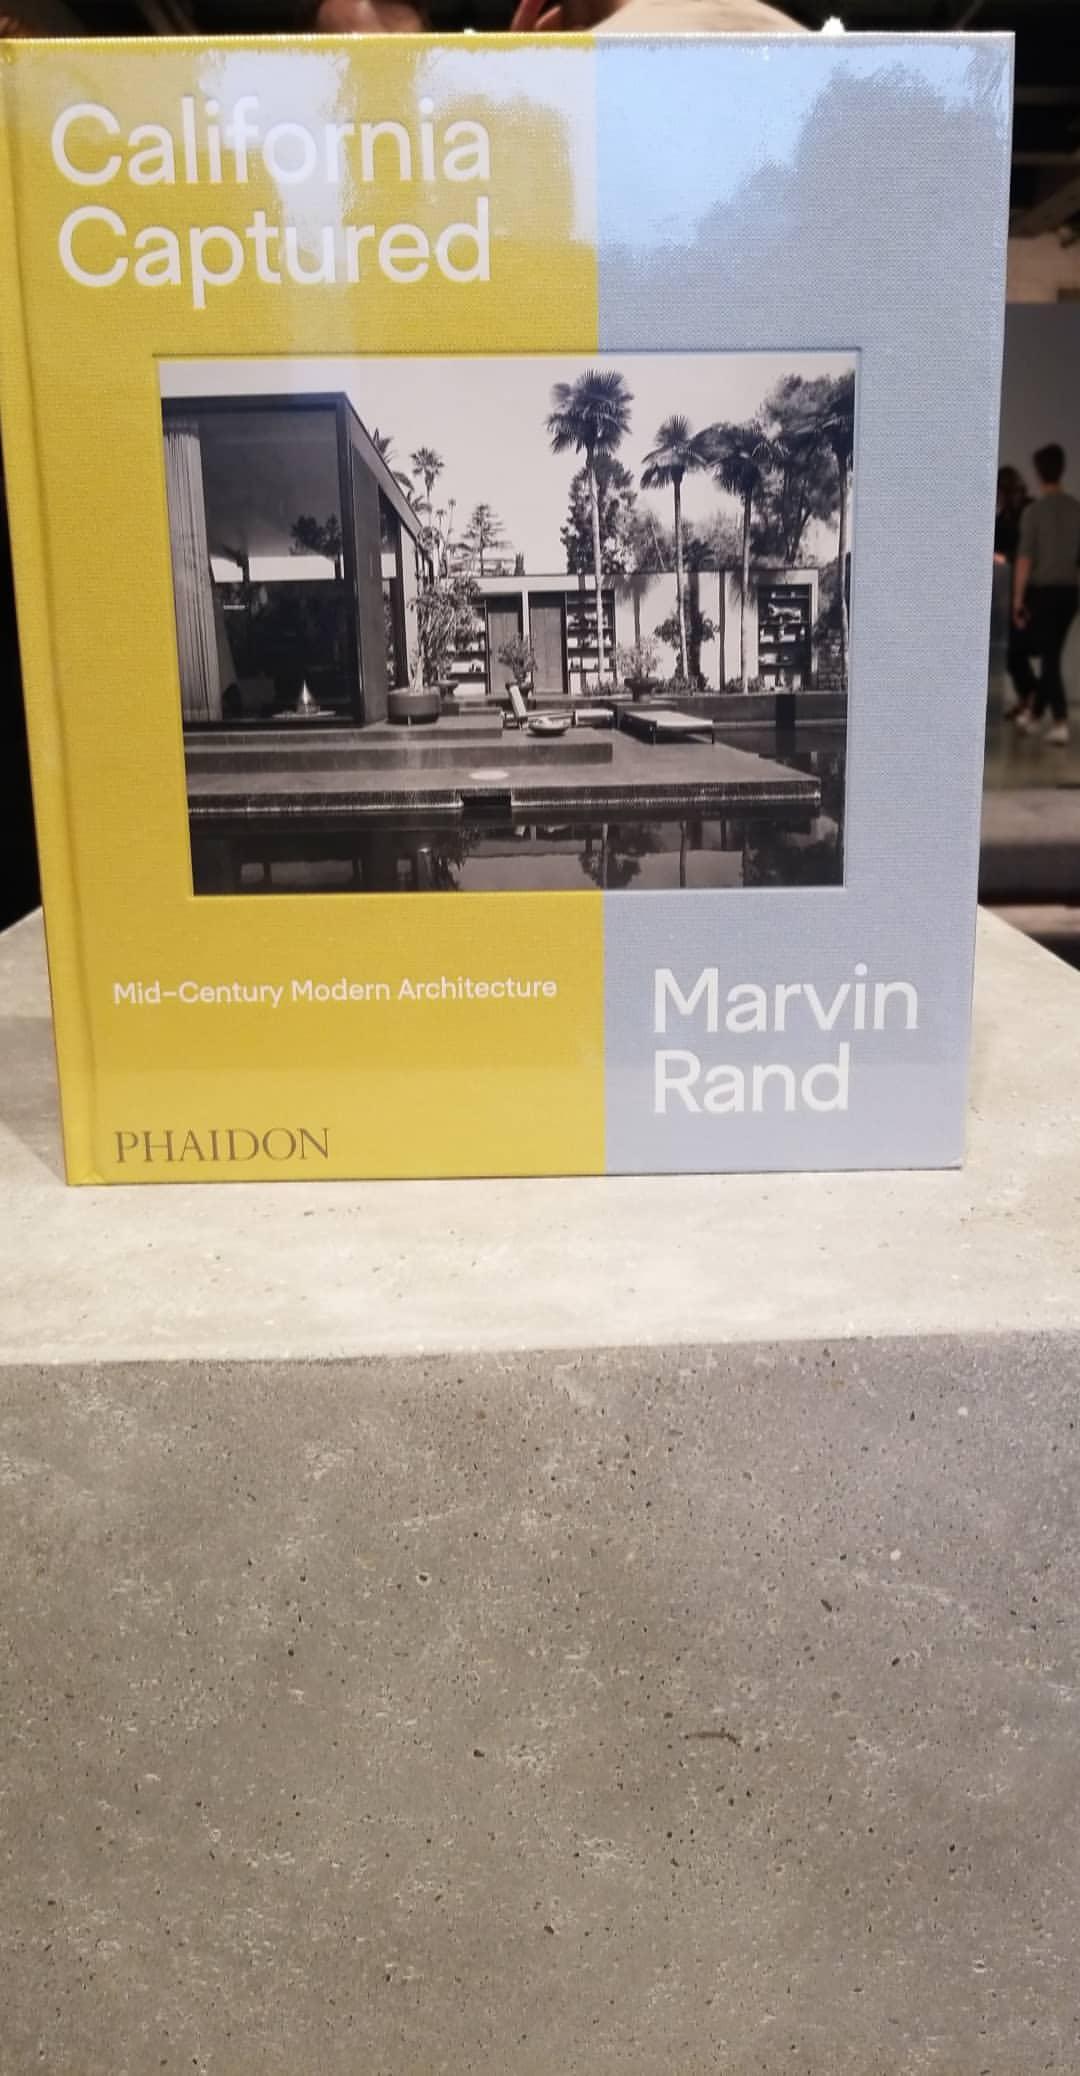 Theory | PHAIDON | The Garnette Report